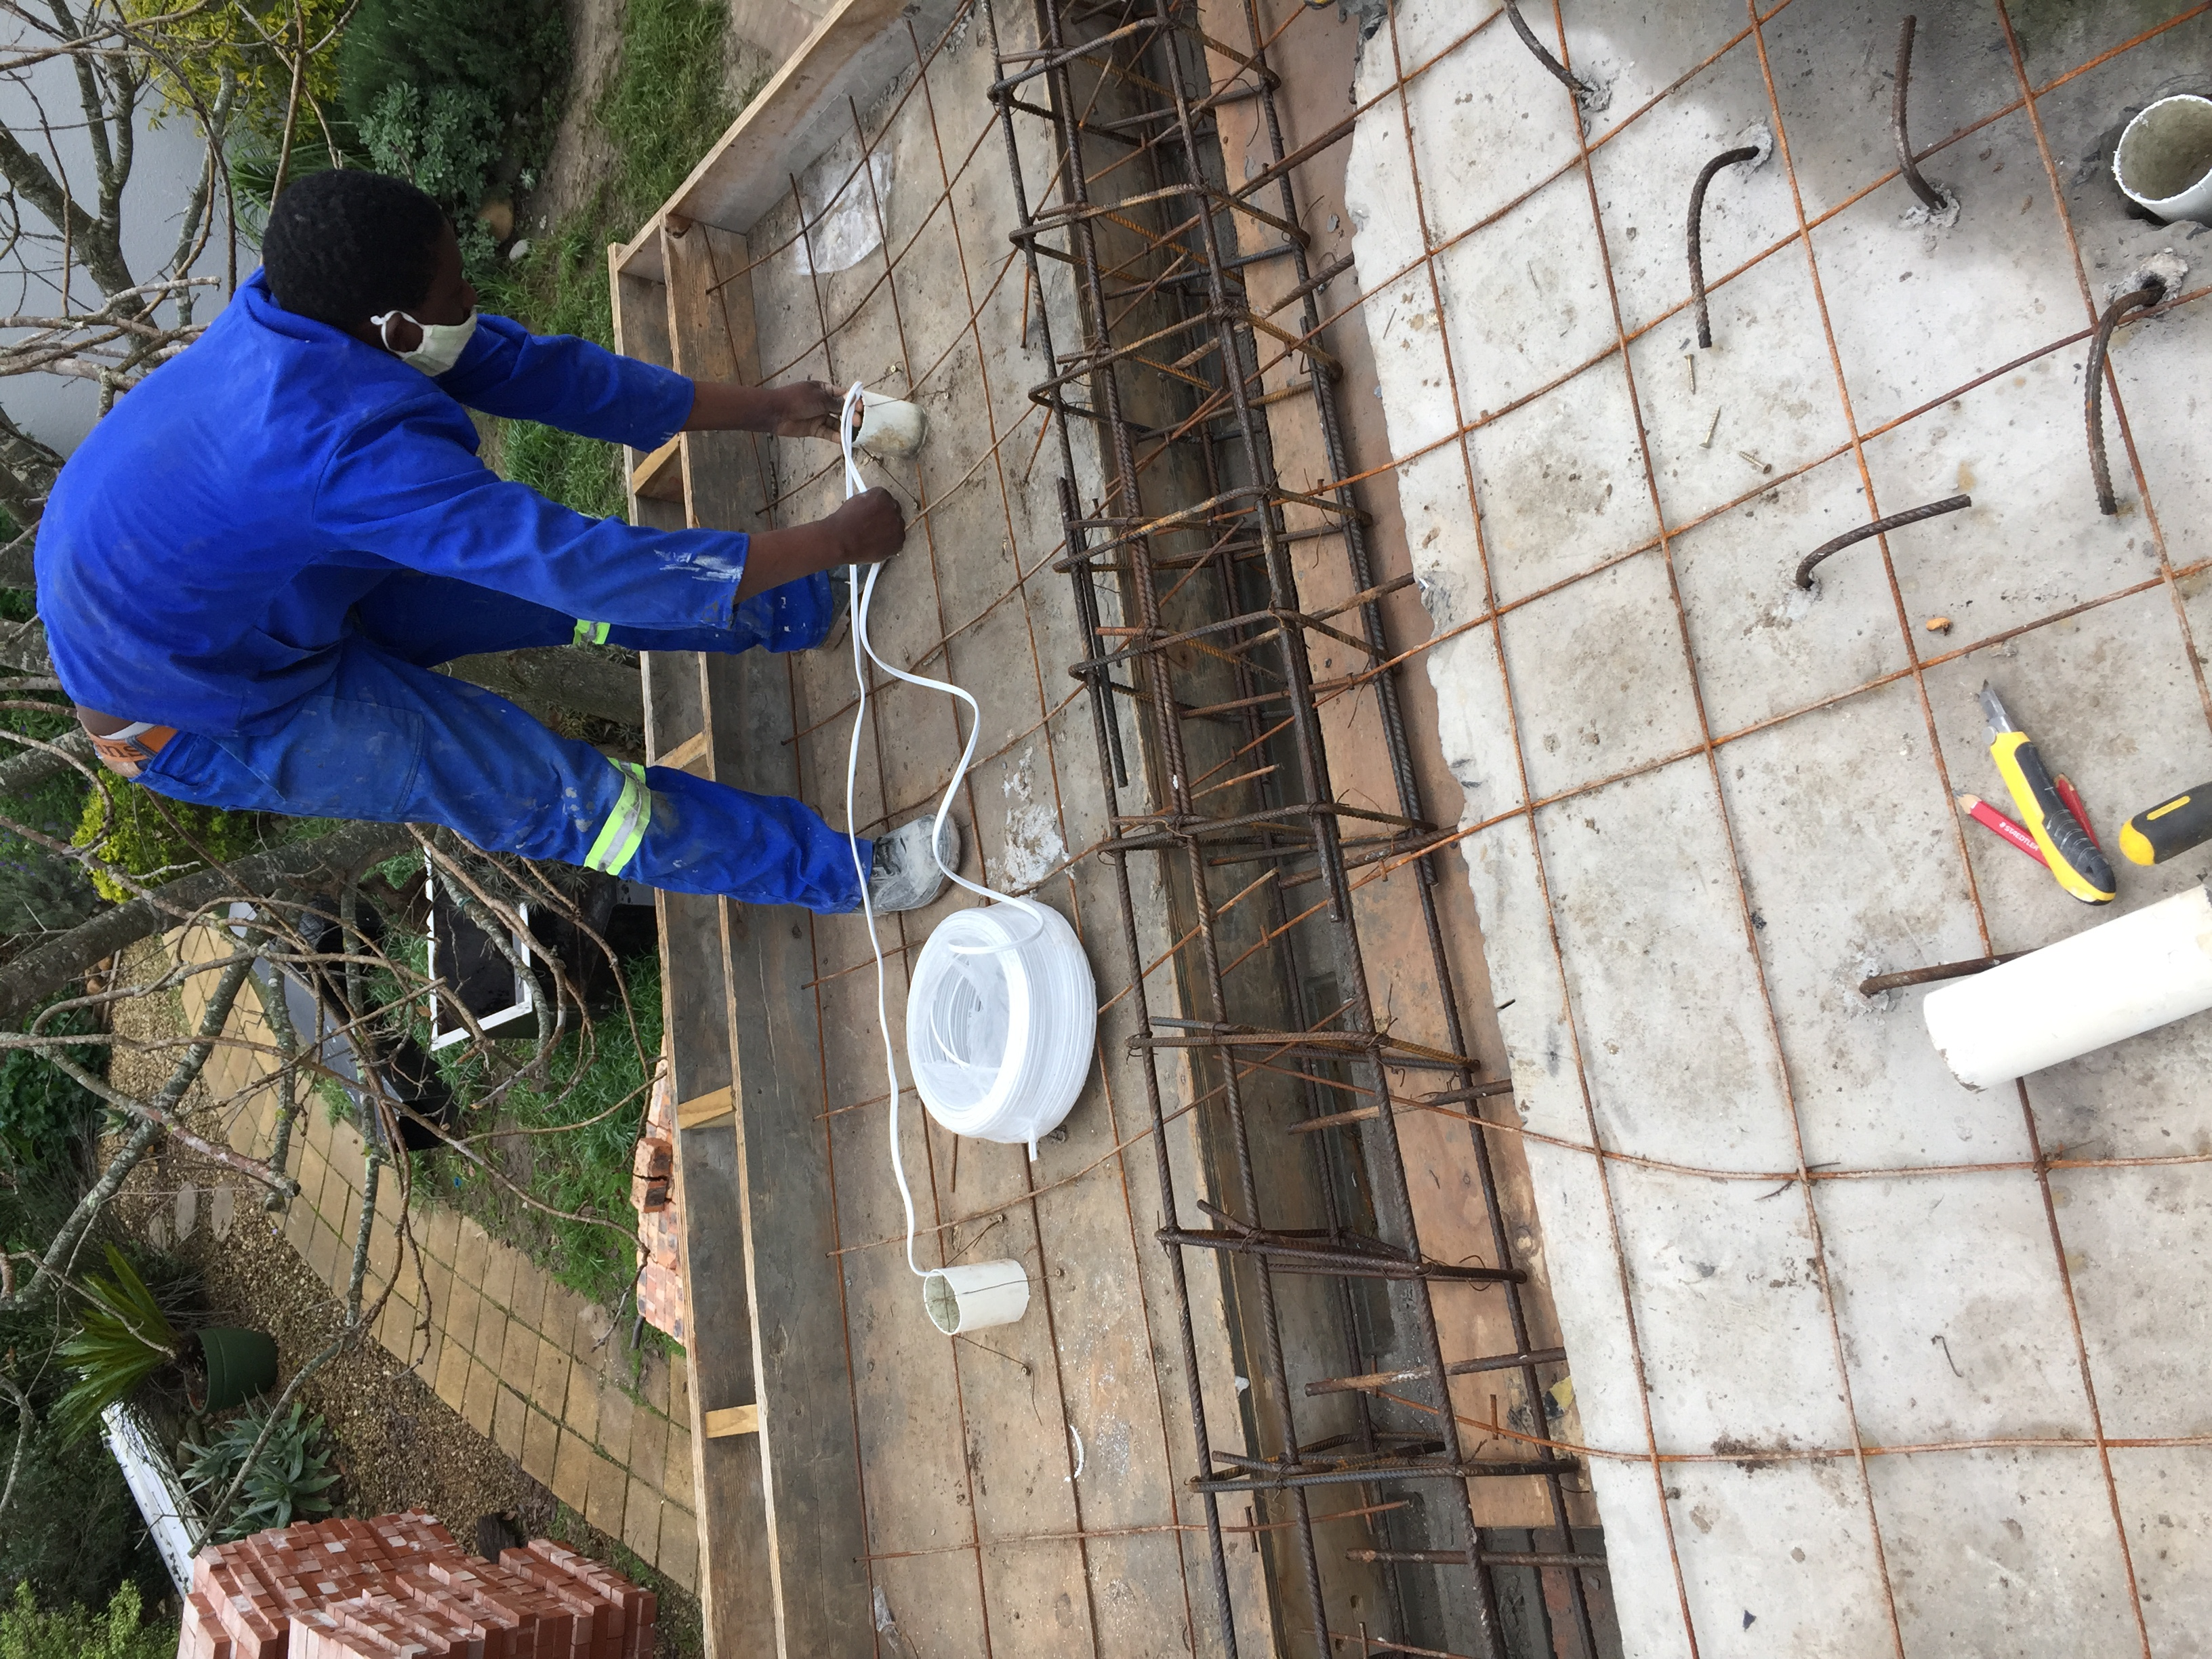 Overhang preparation